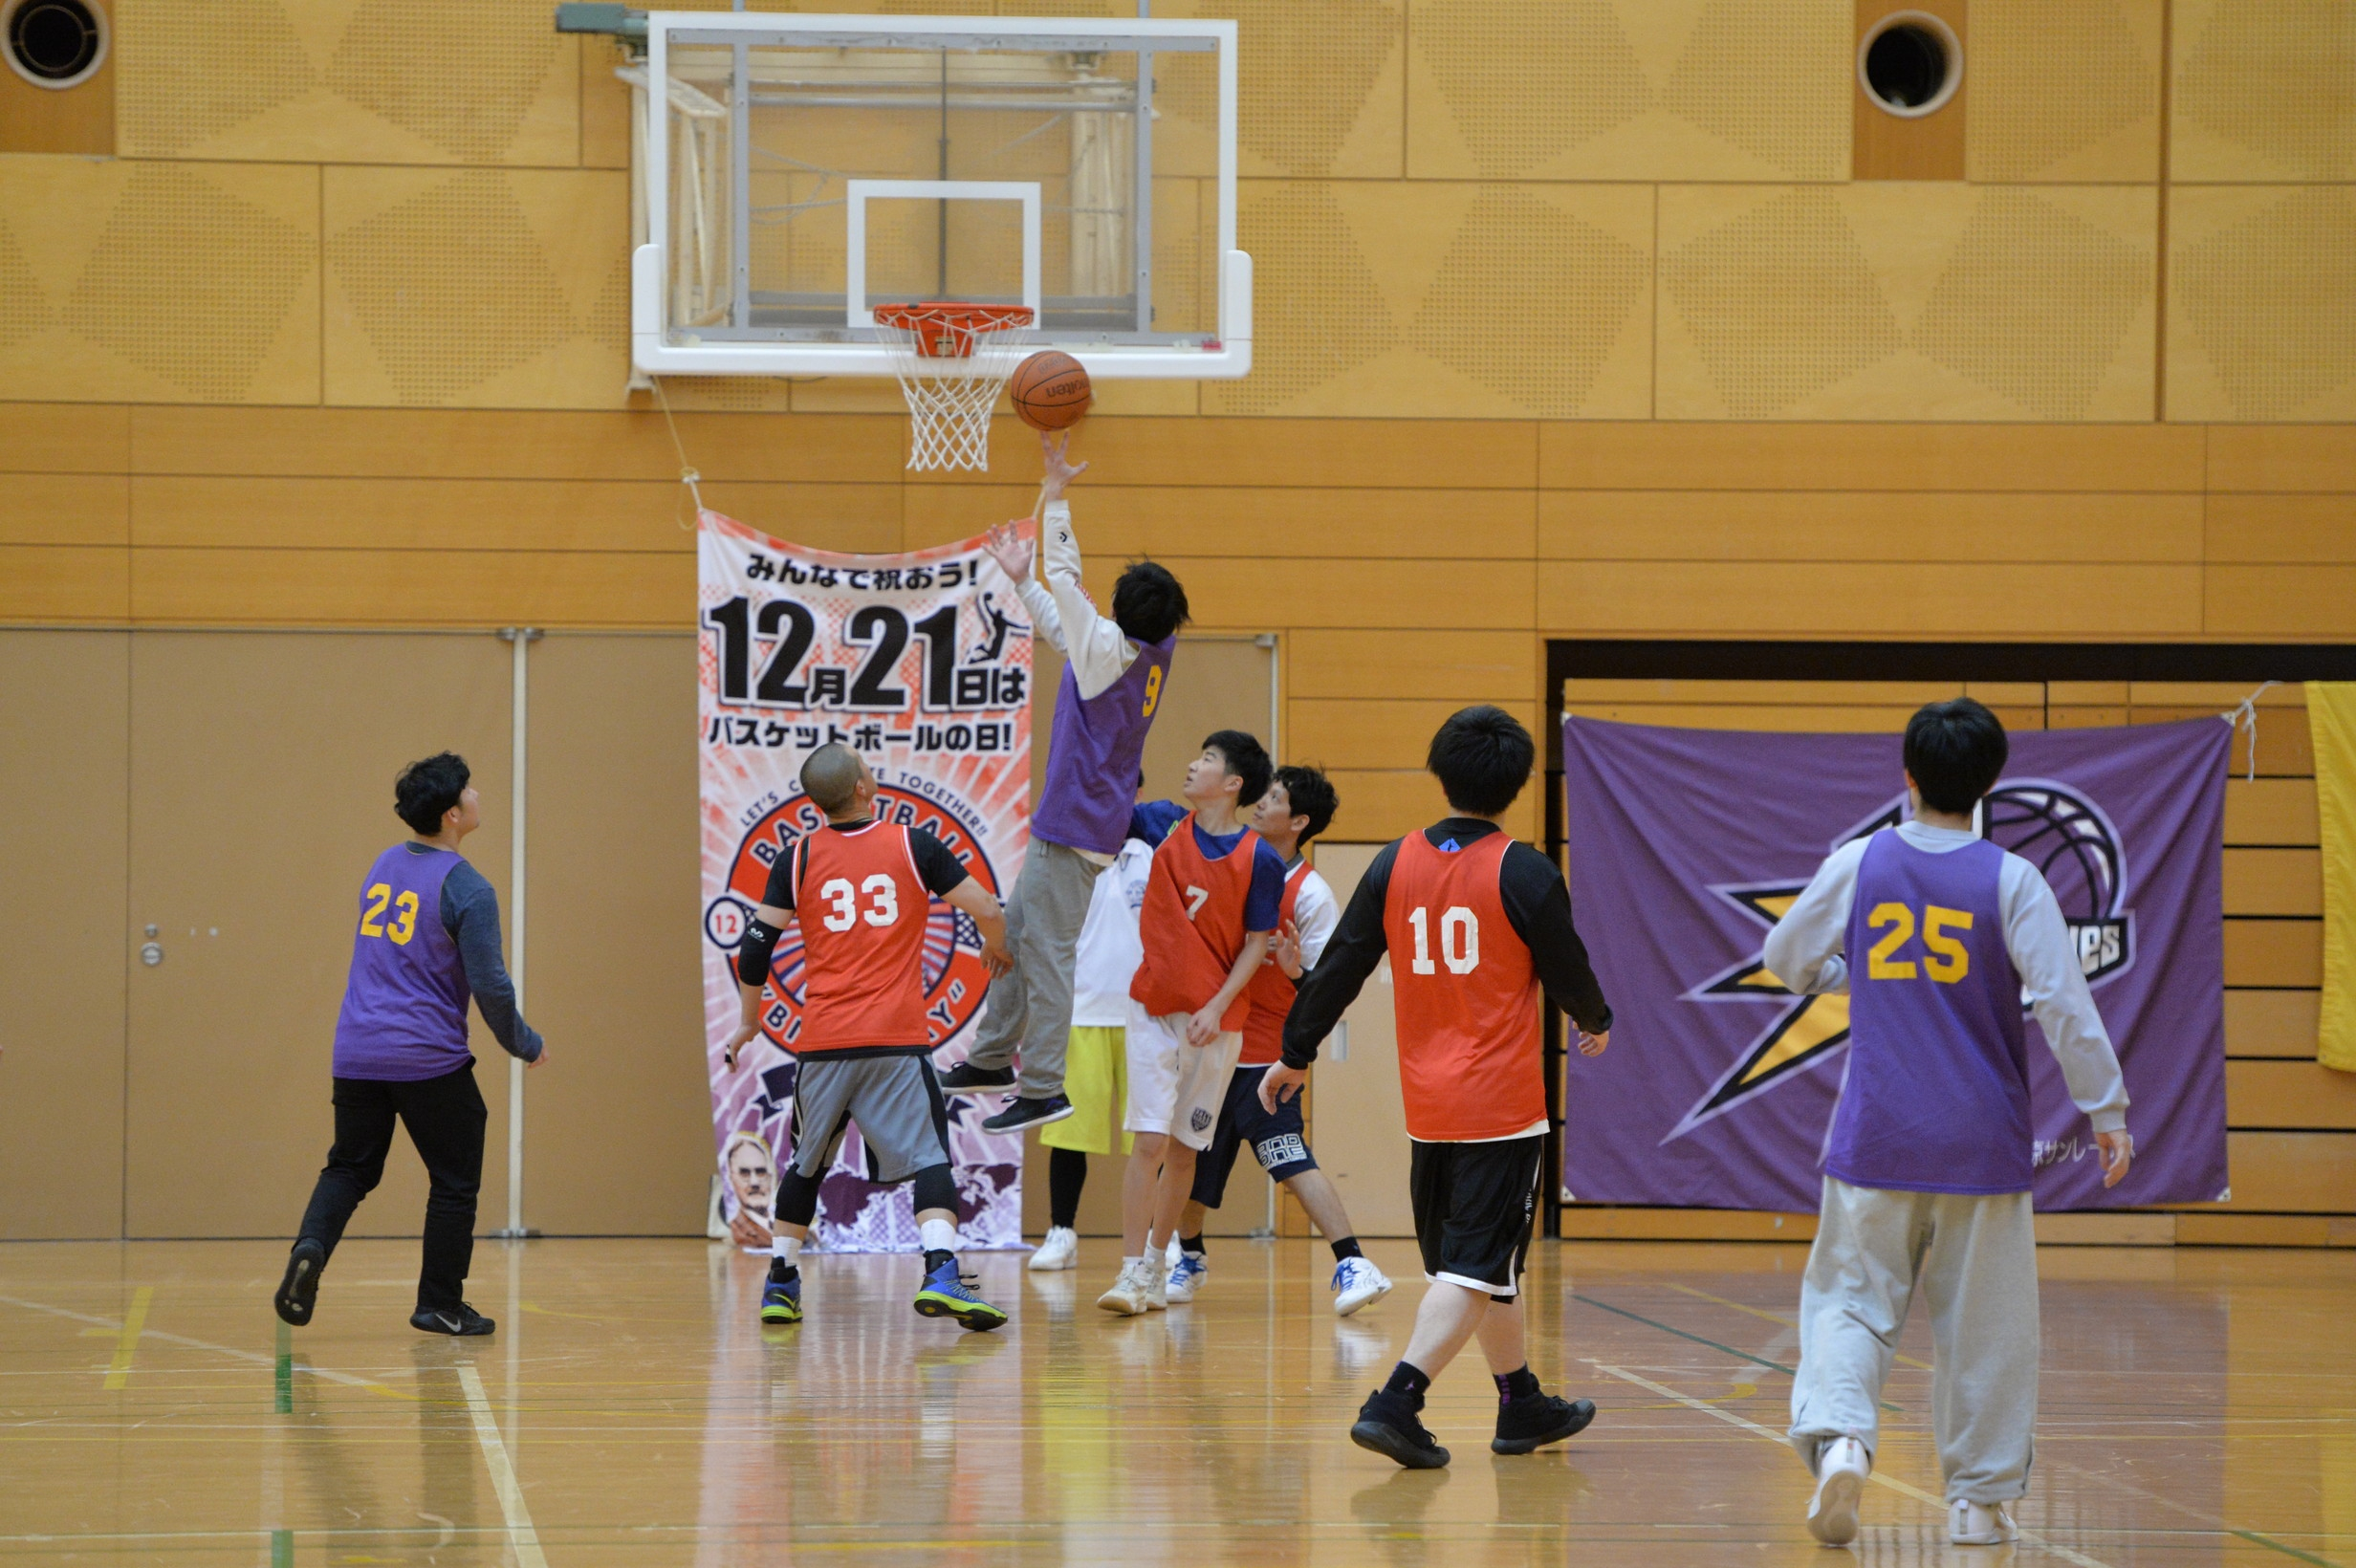 BasketballBirthdayClassic2017【バスケの日】開催リポート